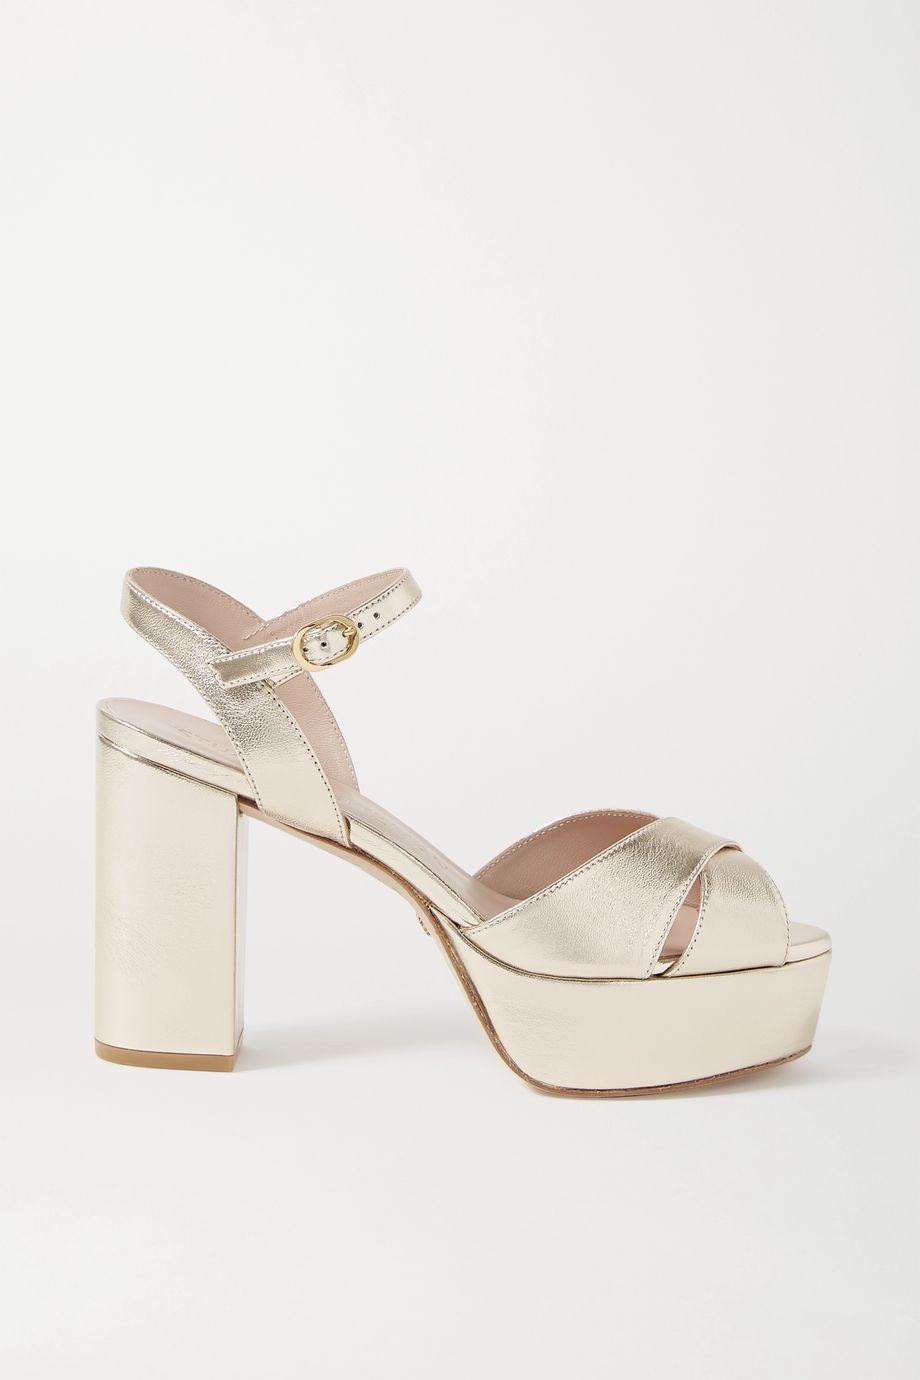 Stuart Weitzman Ivona metallic leather sandals